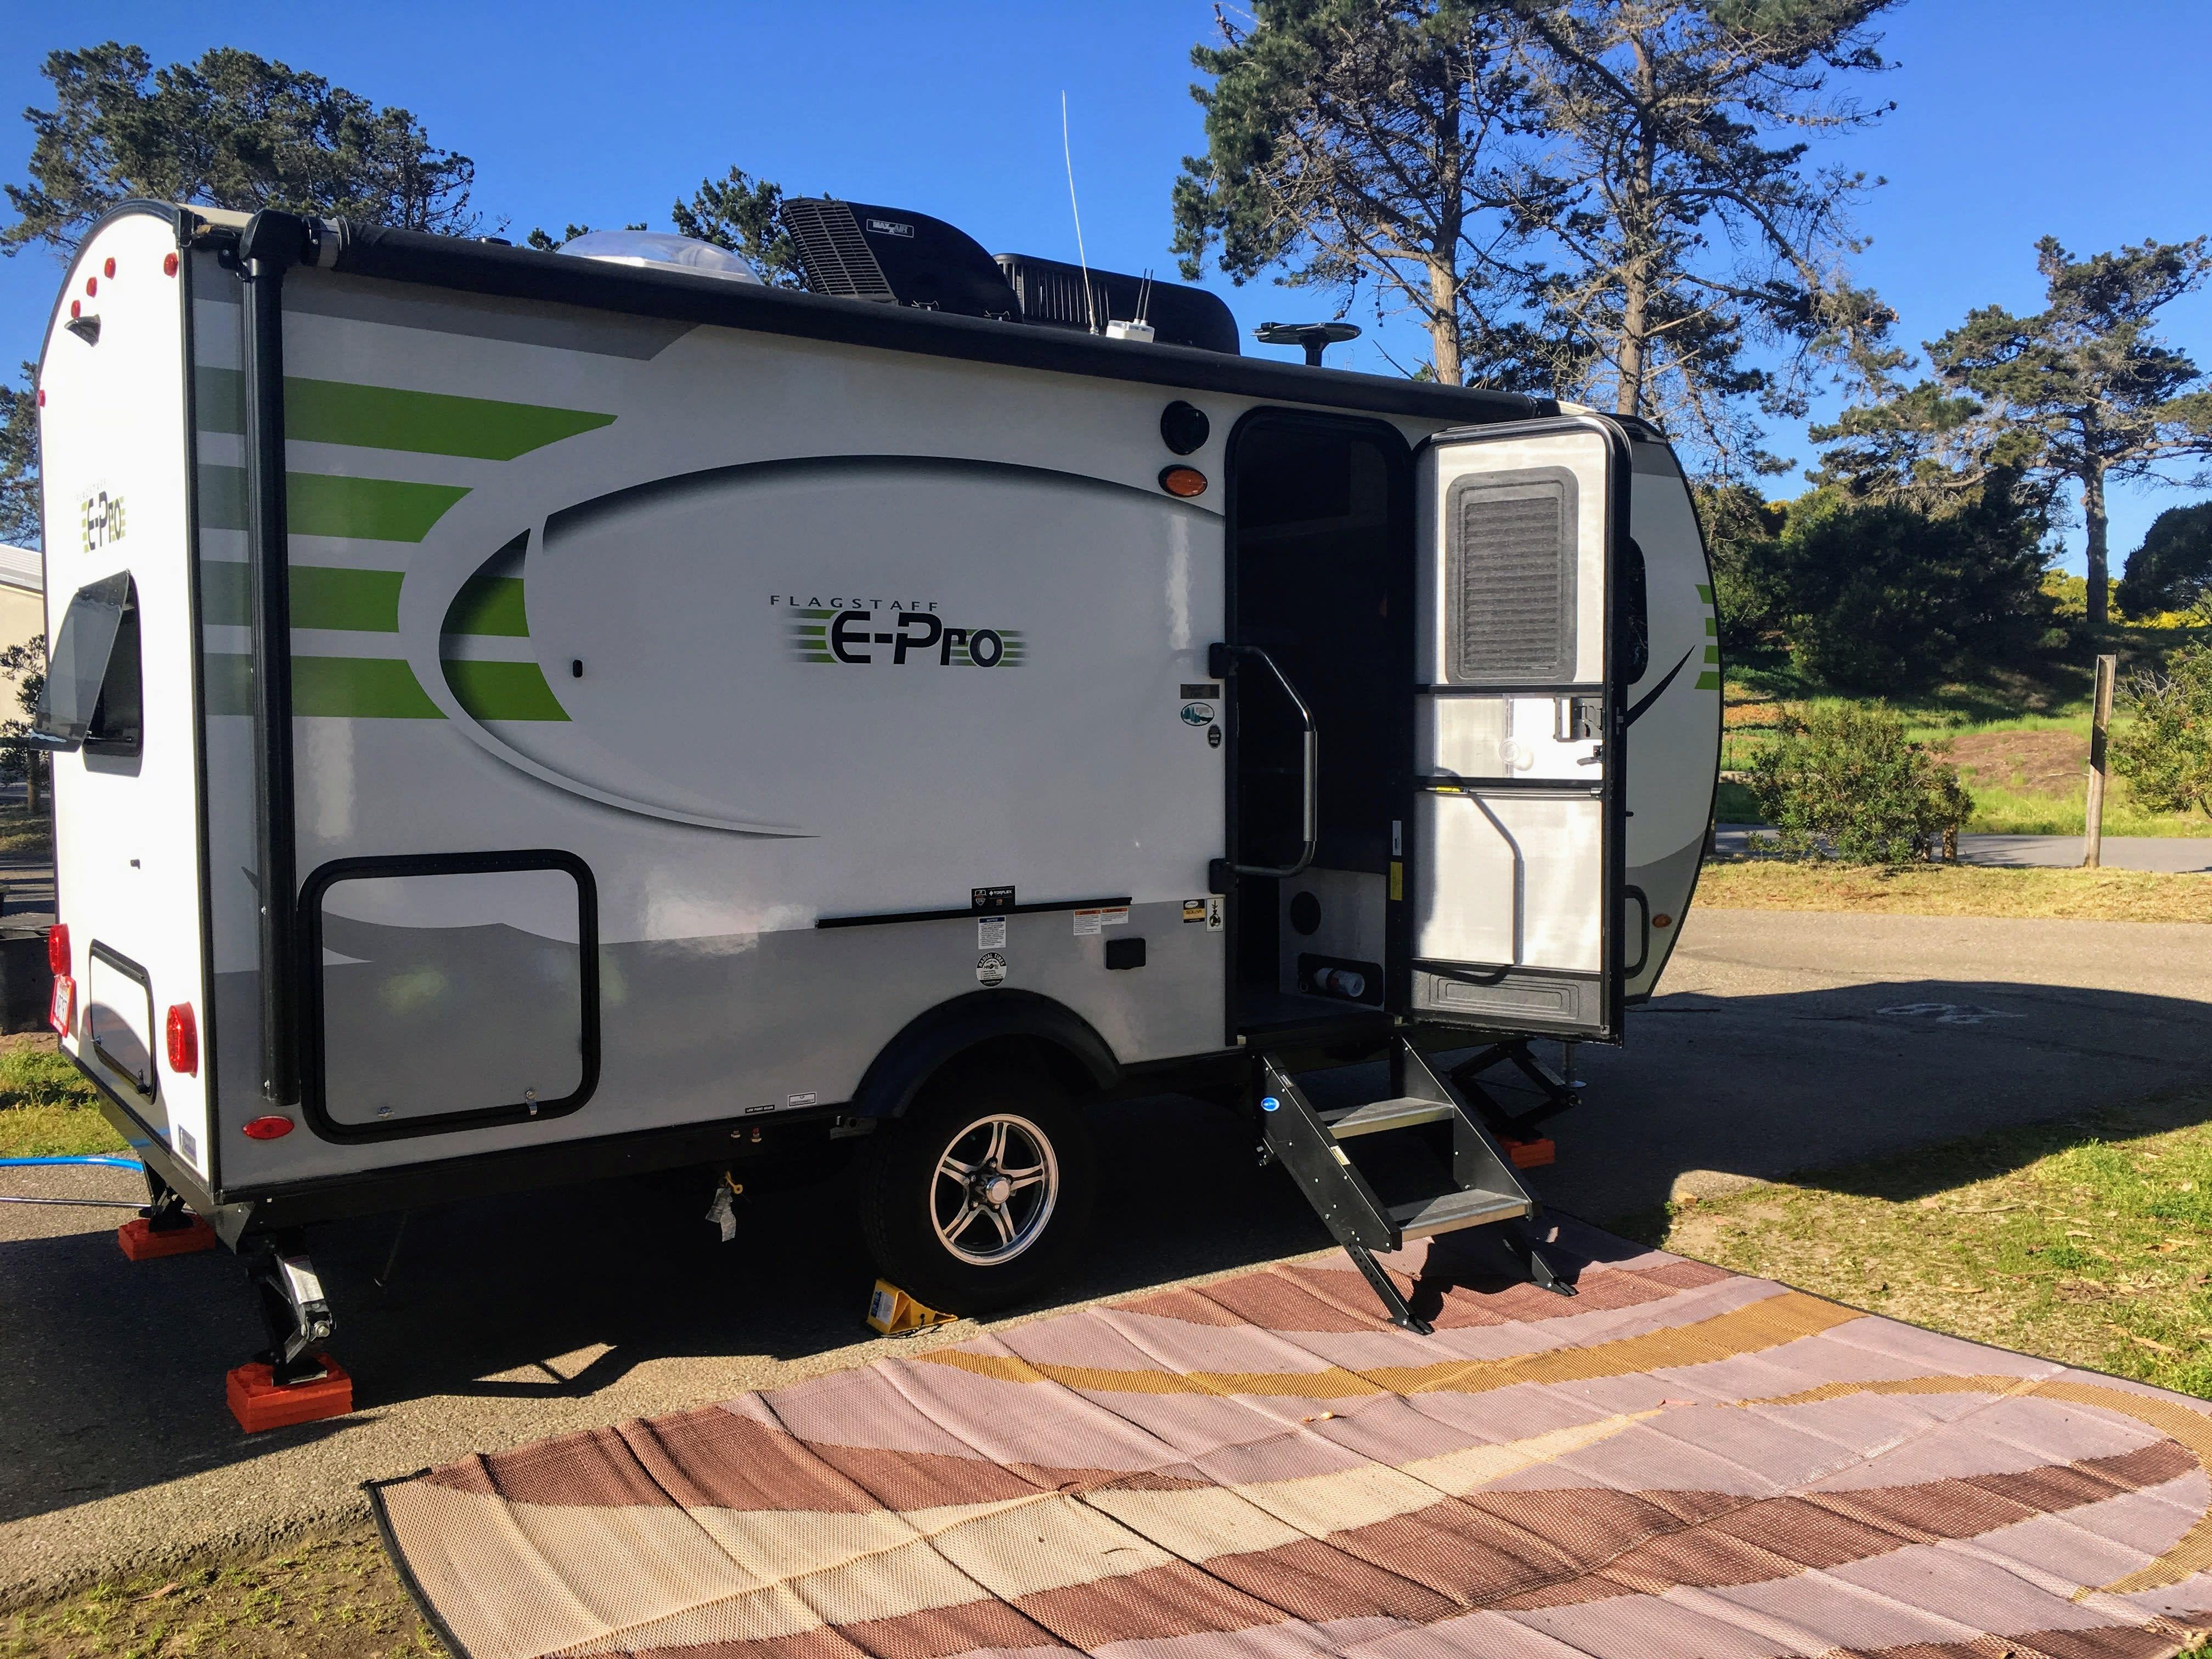 Flagstaff E-Pro 2019